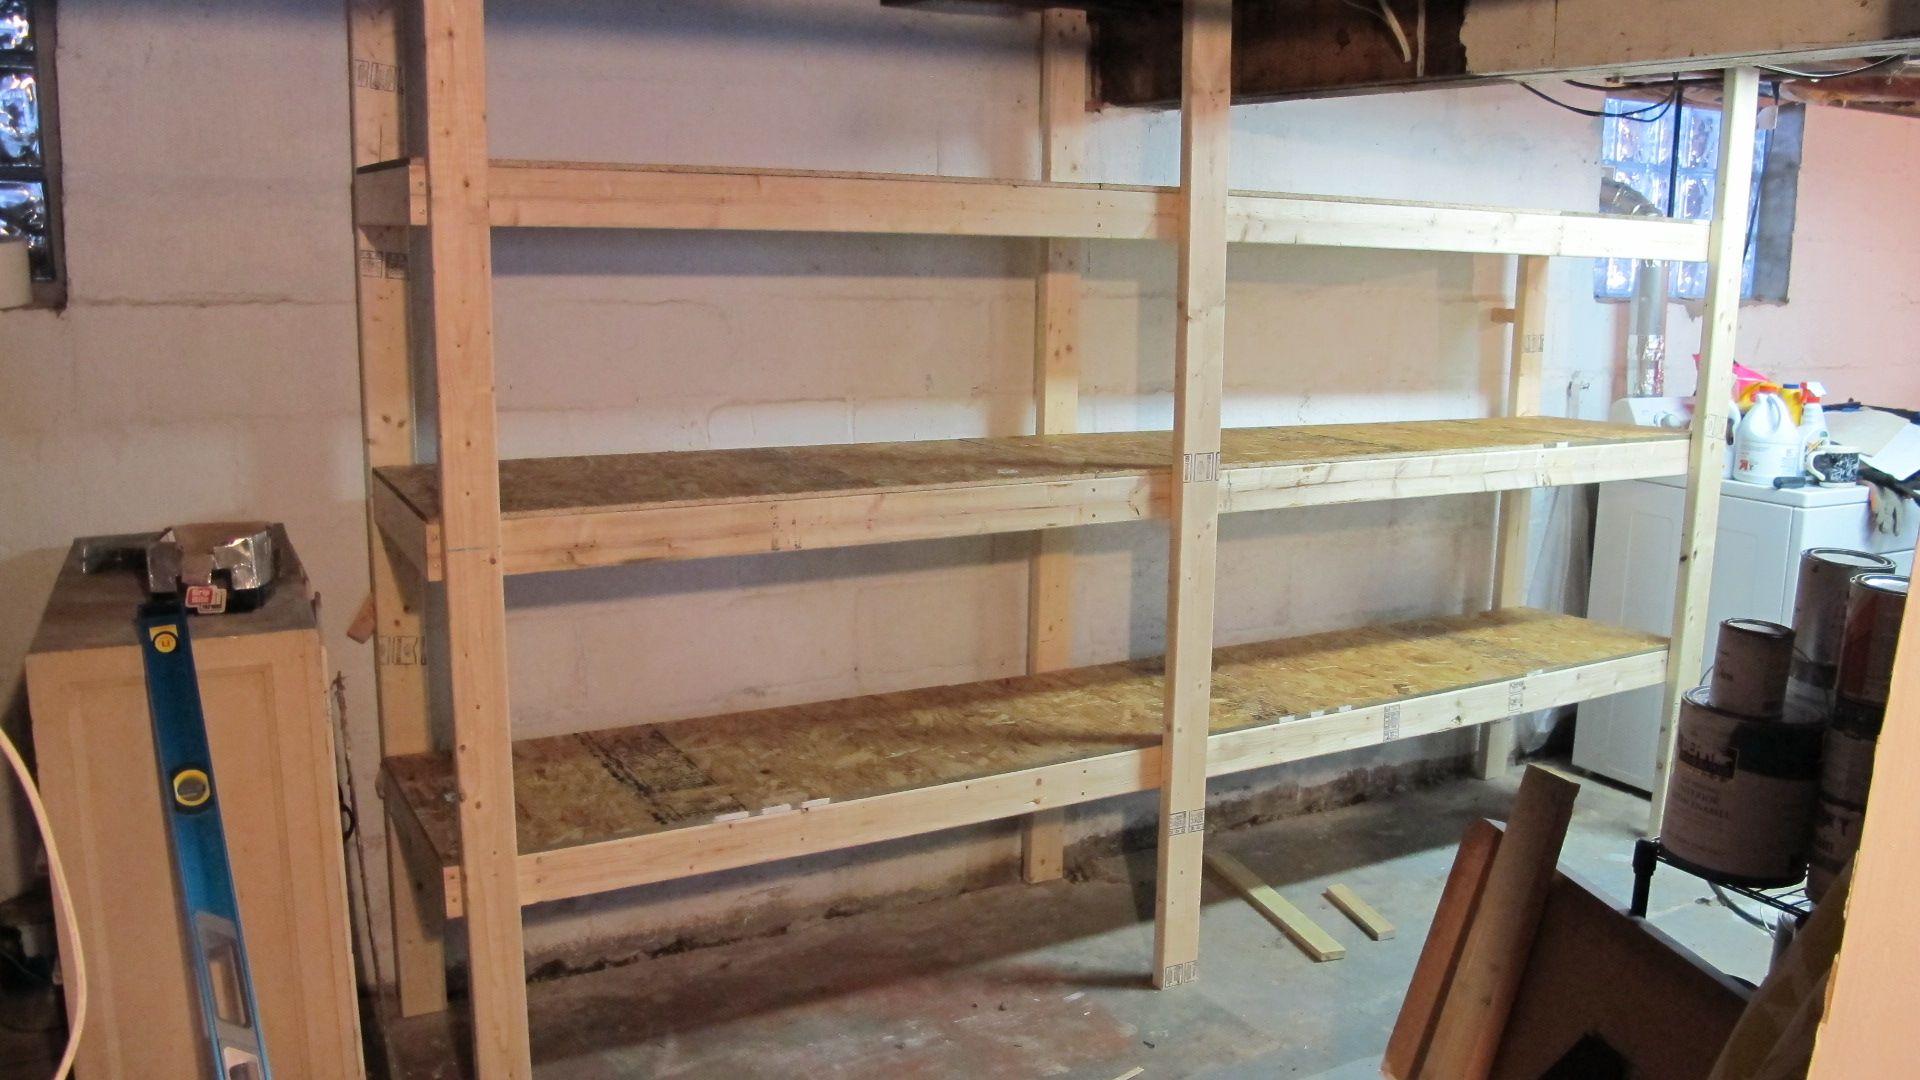 Diy Basement Shelves In A Day Merrypad Organization